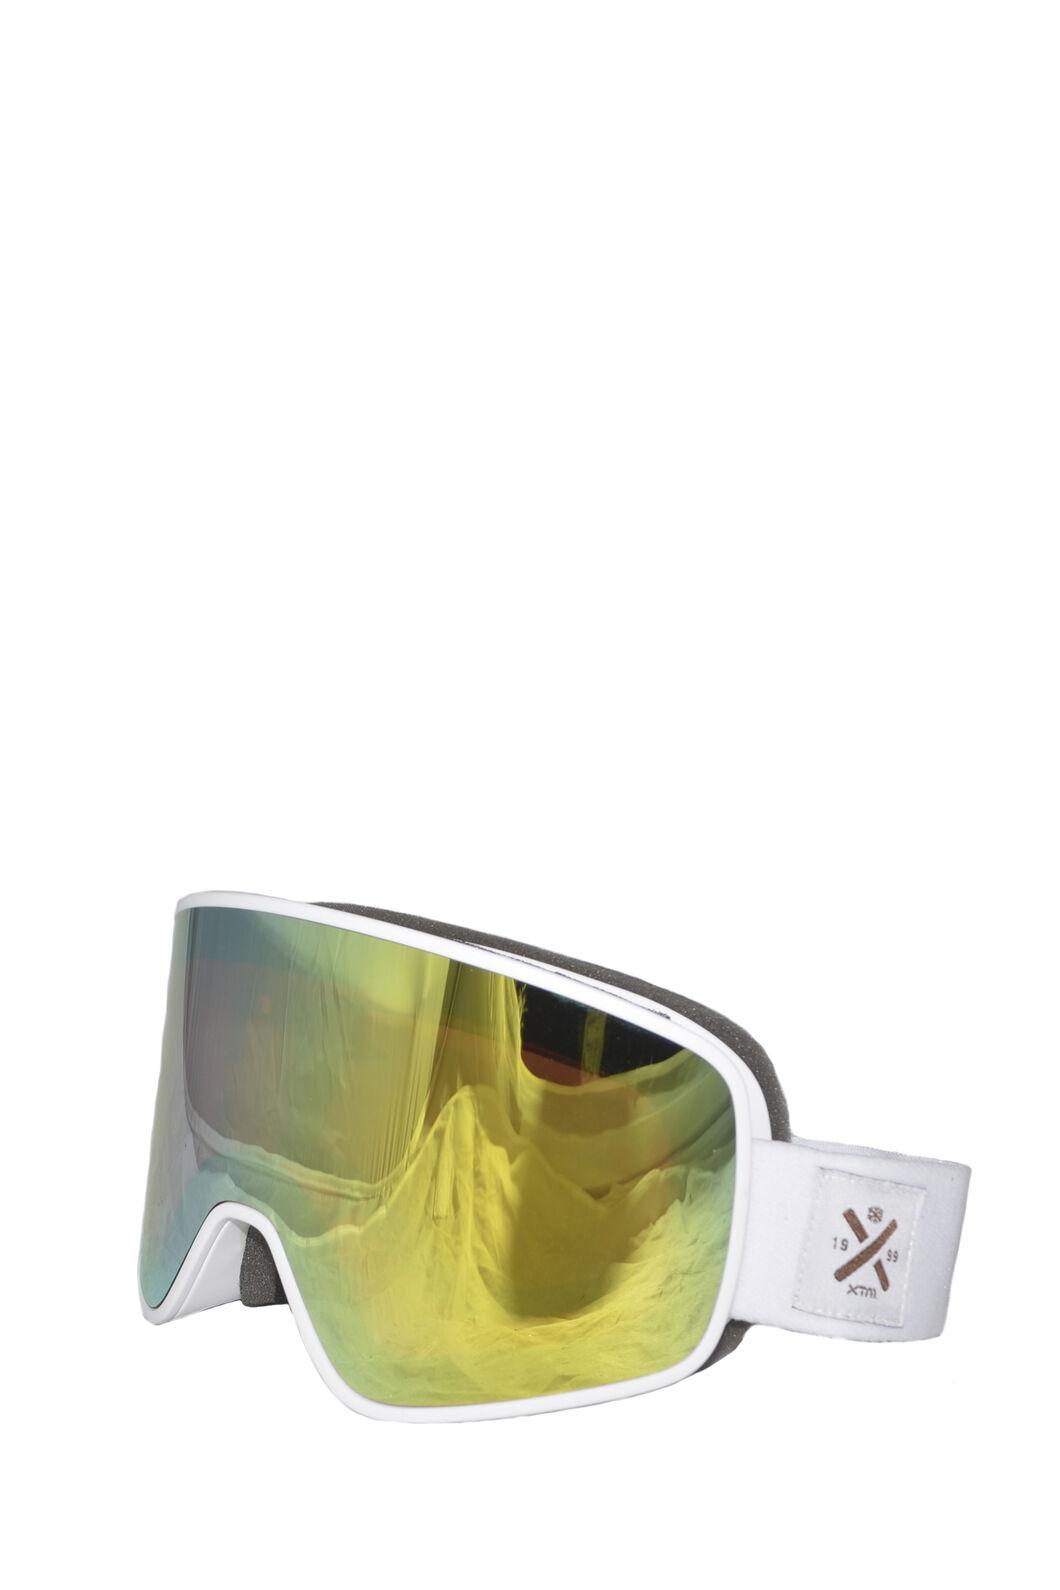 XTM Zephyr Goggles, White, hi-res